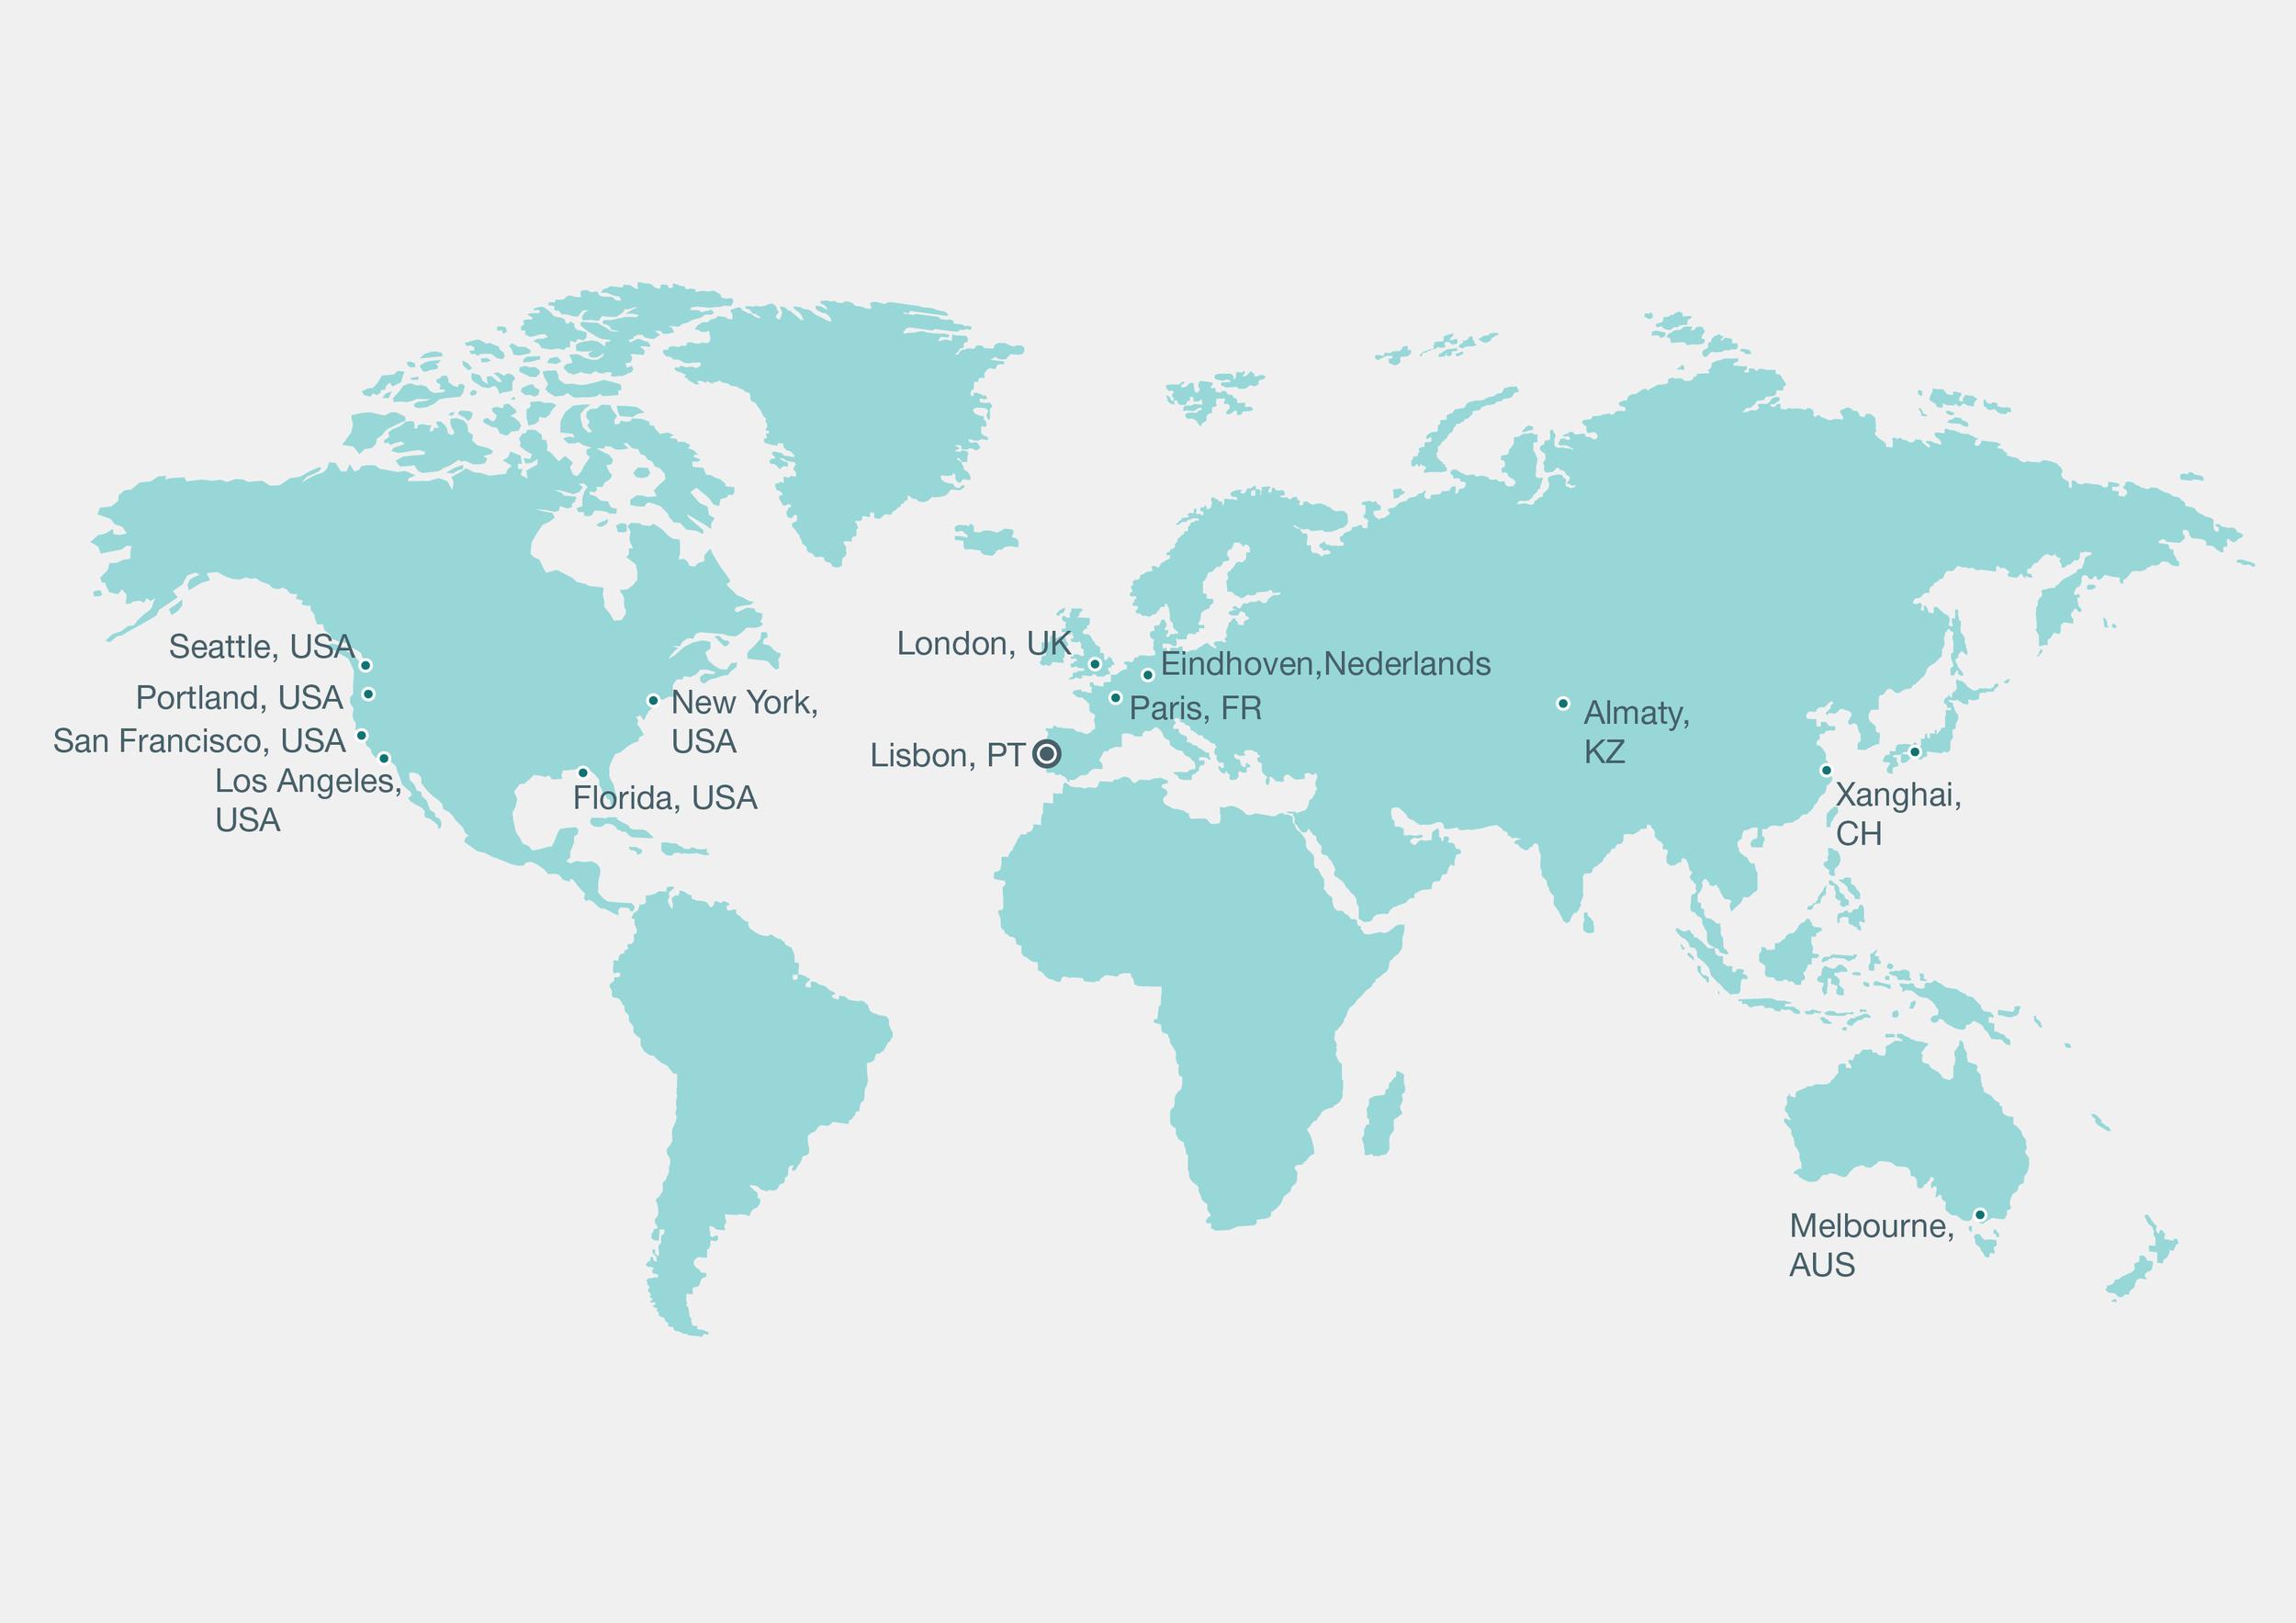 World_Map_Se7e-02.png